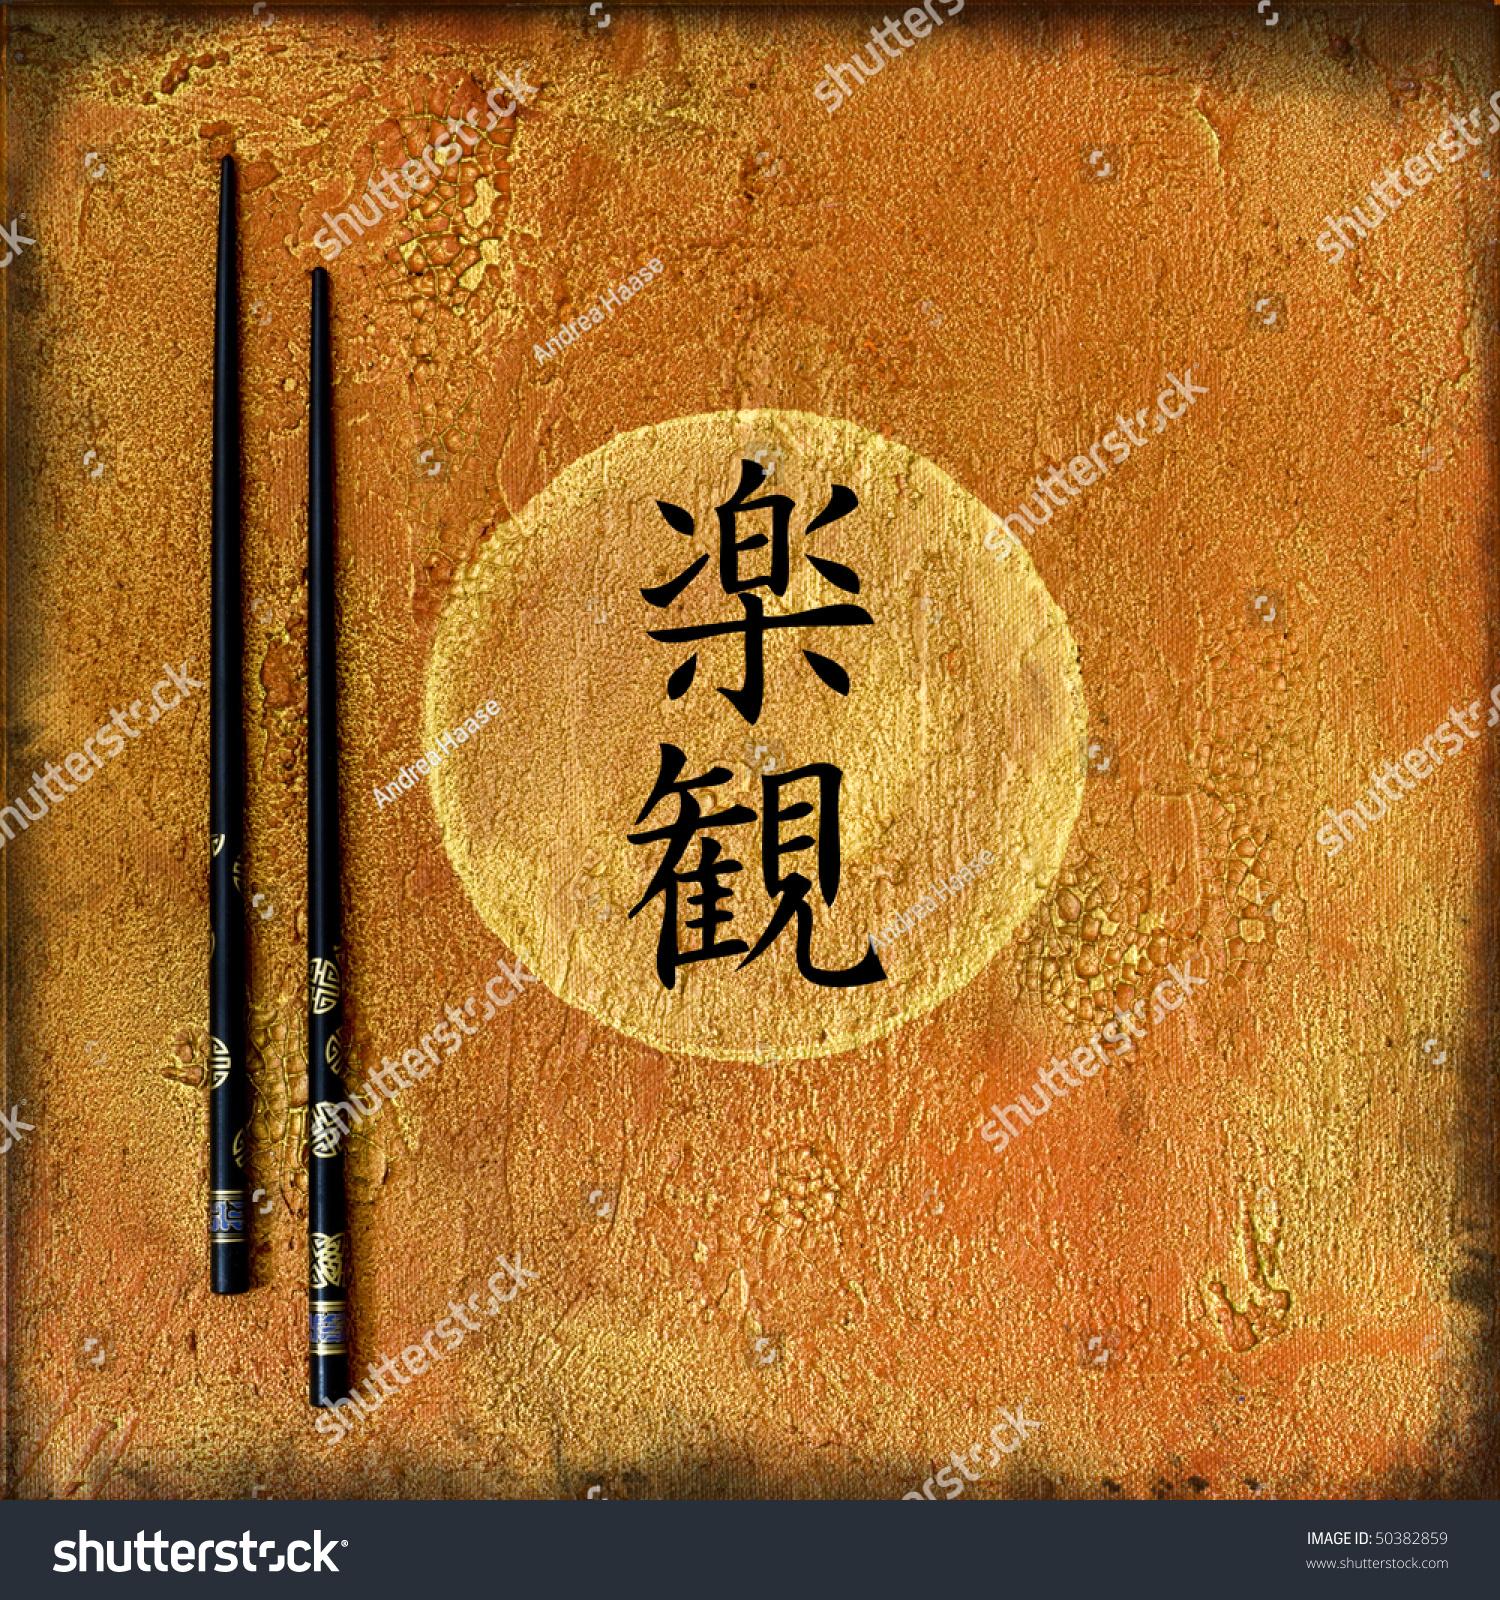 Artwork Chinese Symbol Optimism Art Digital Stock Illustration